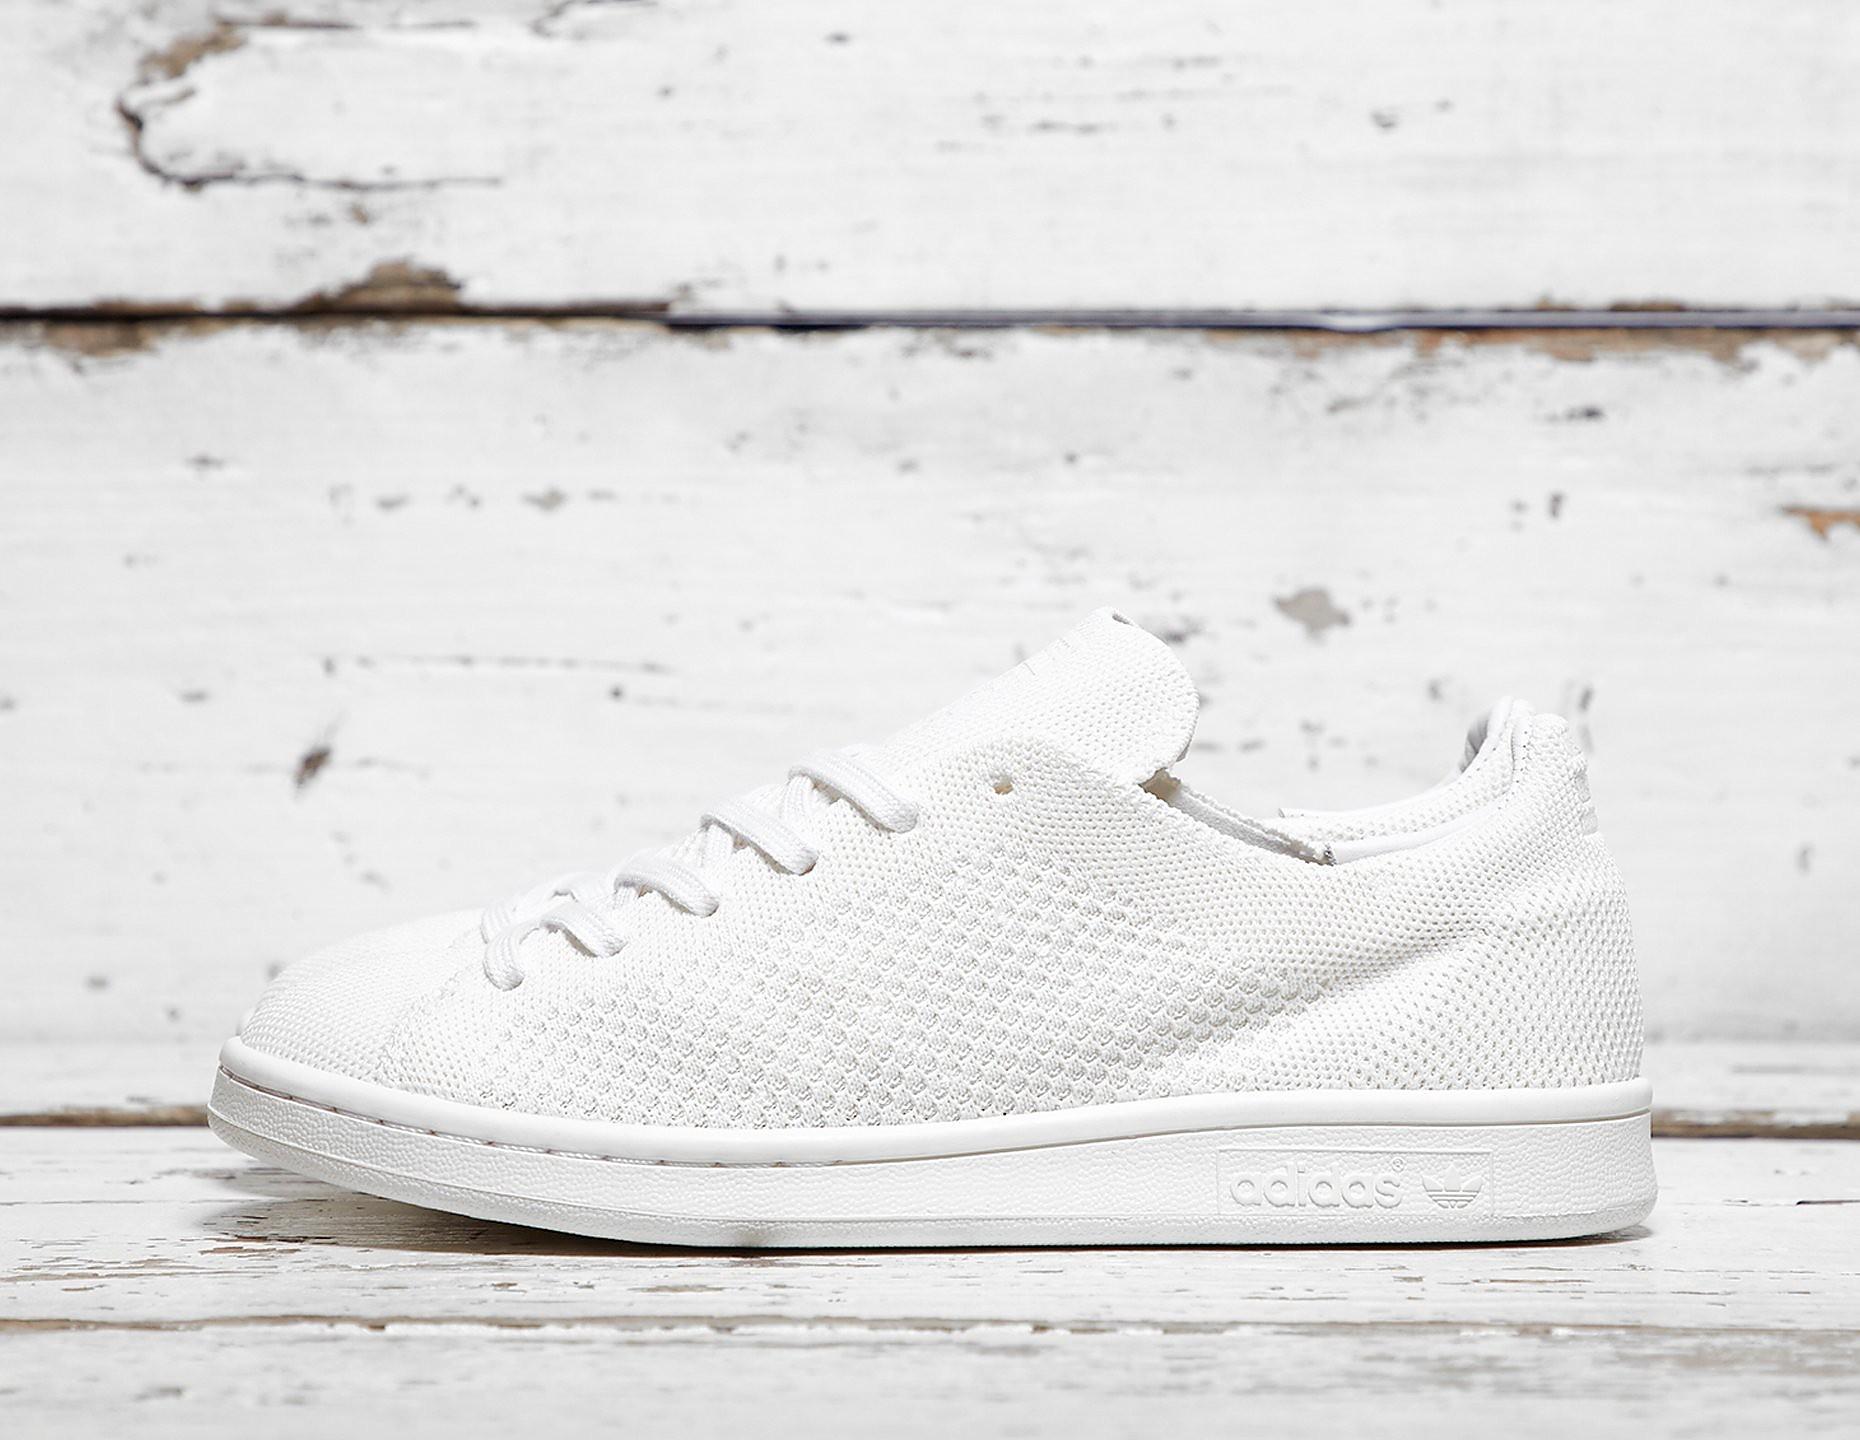 Adidas x Pharrell Williams Holi Hu Stan Smith footpatrol